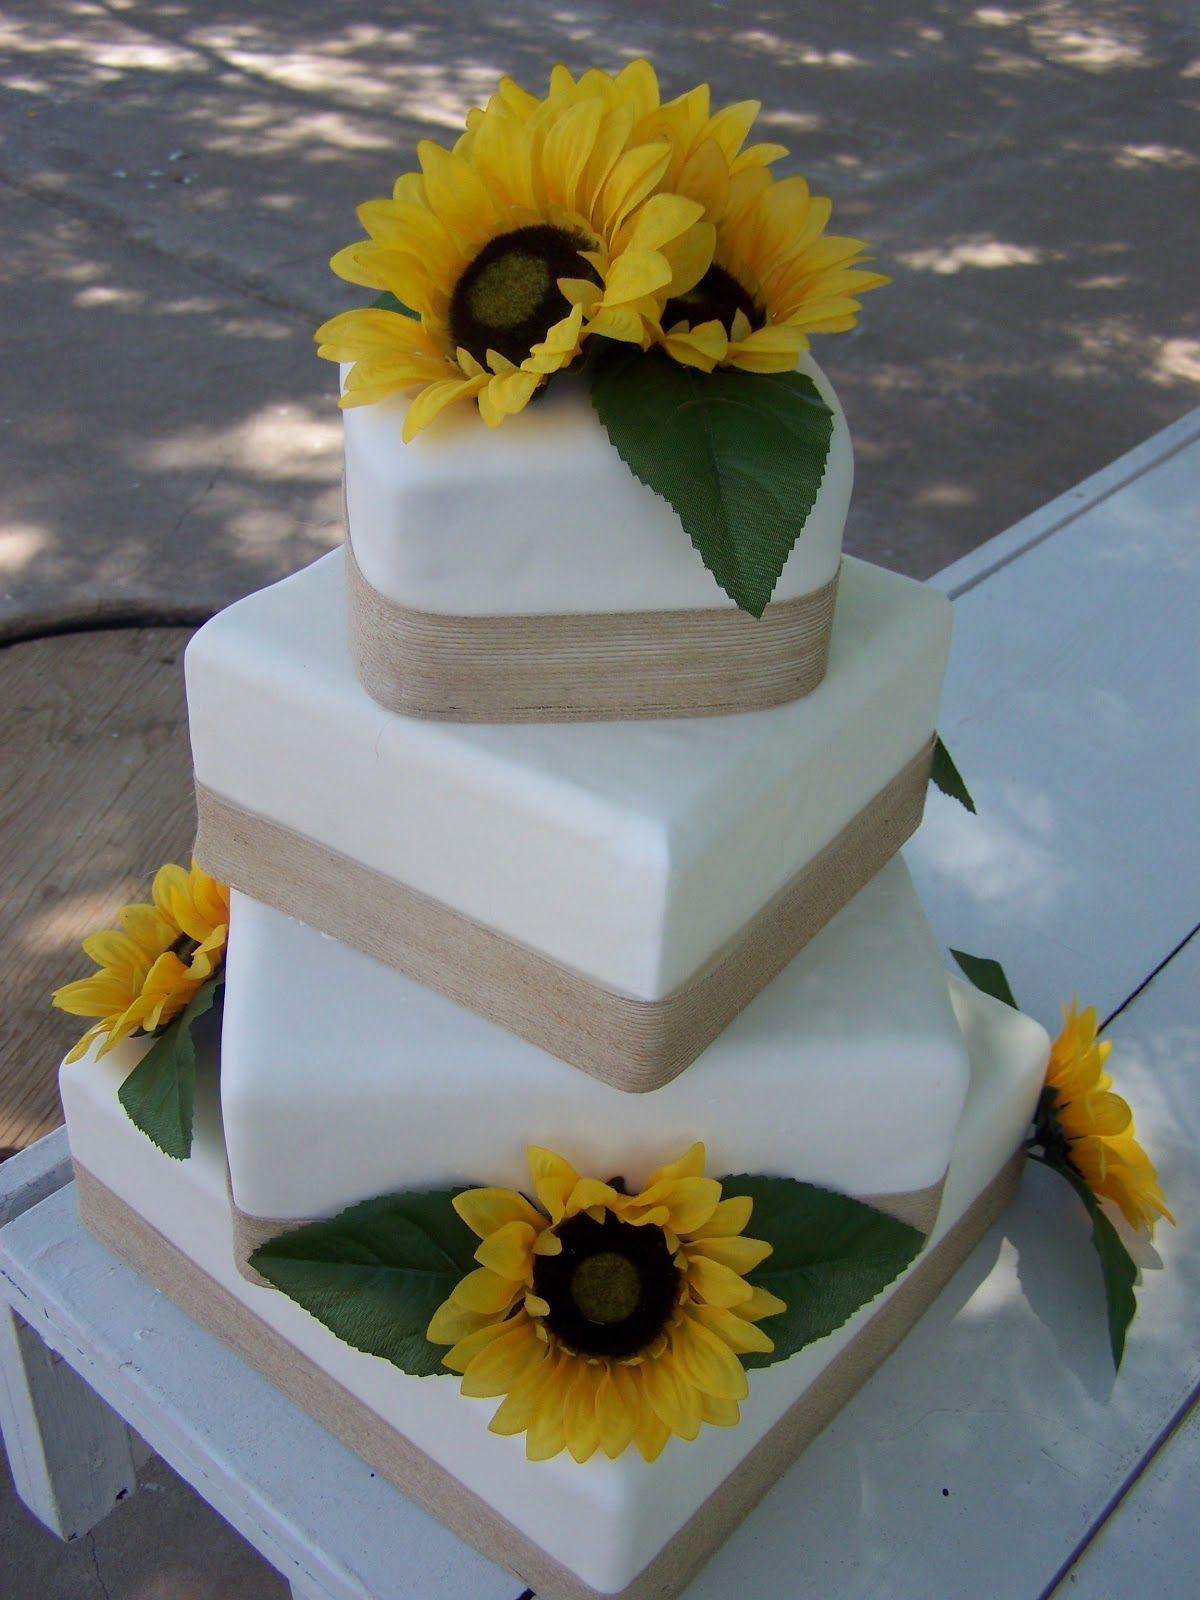 CakeALicious Sunflower & Burlap Wedding Cake Burlap